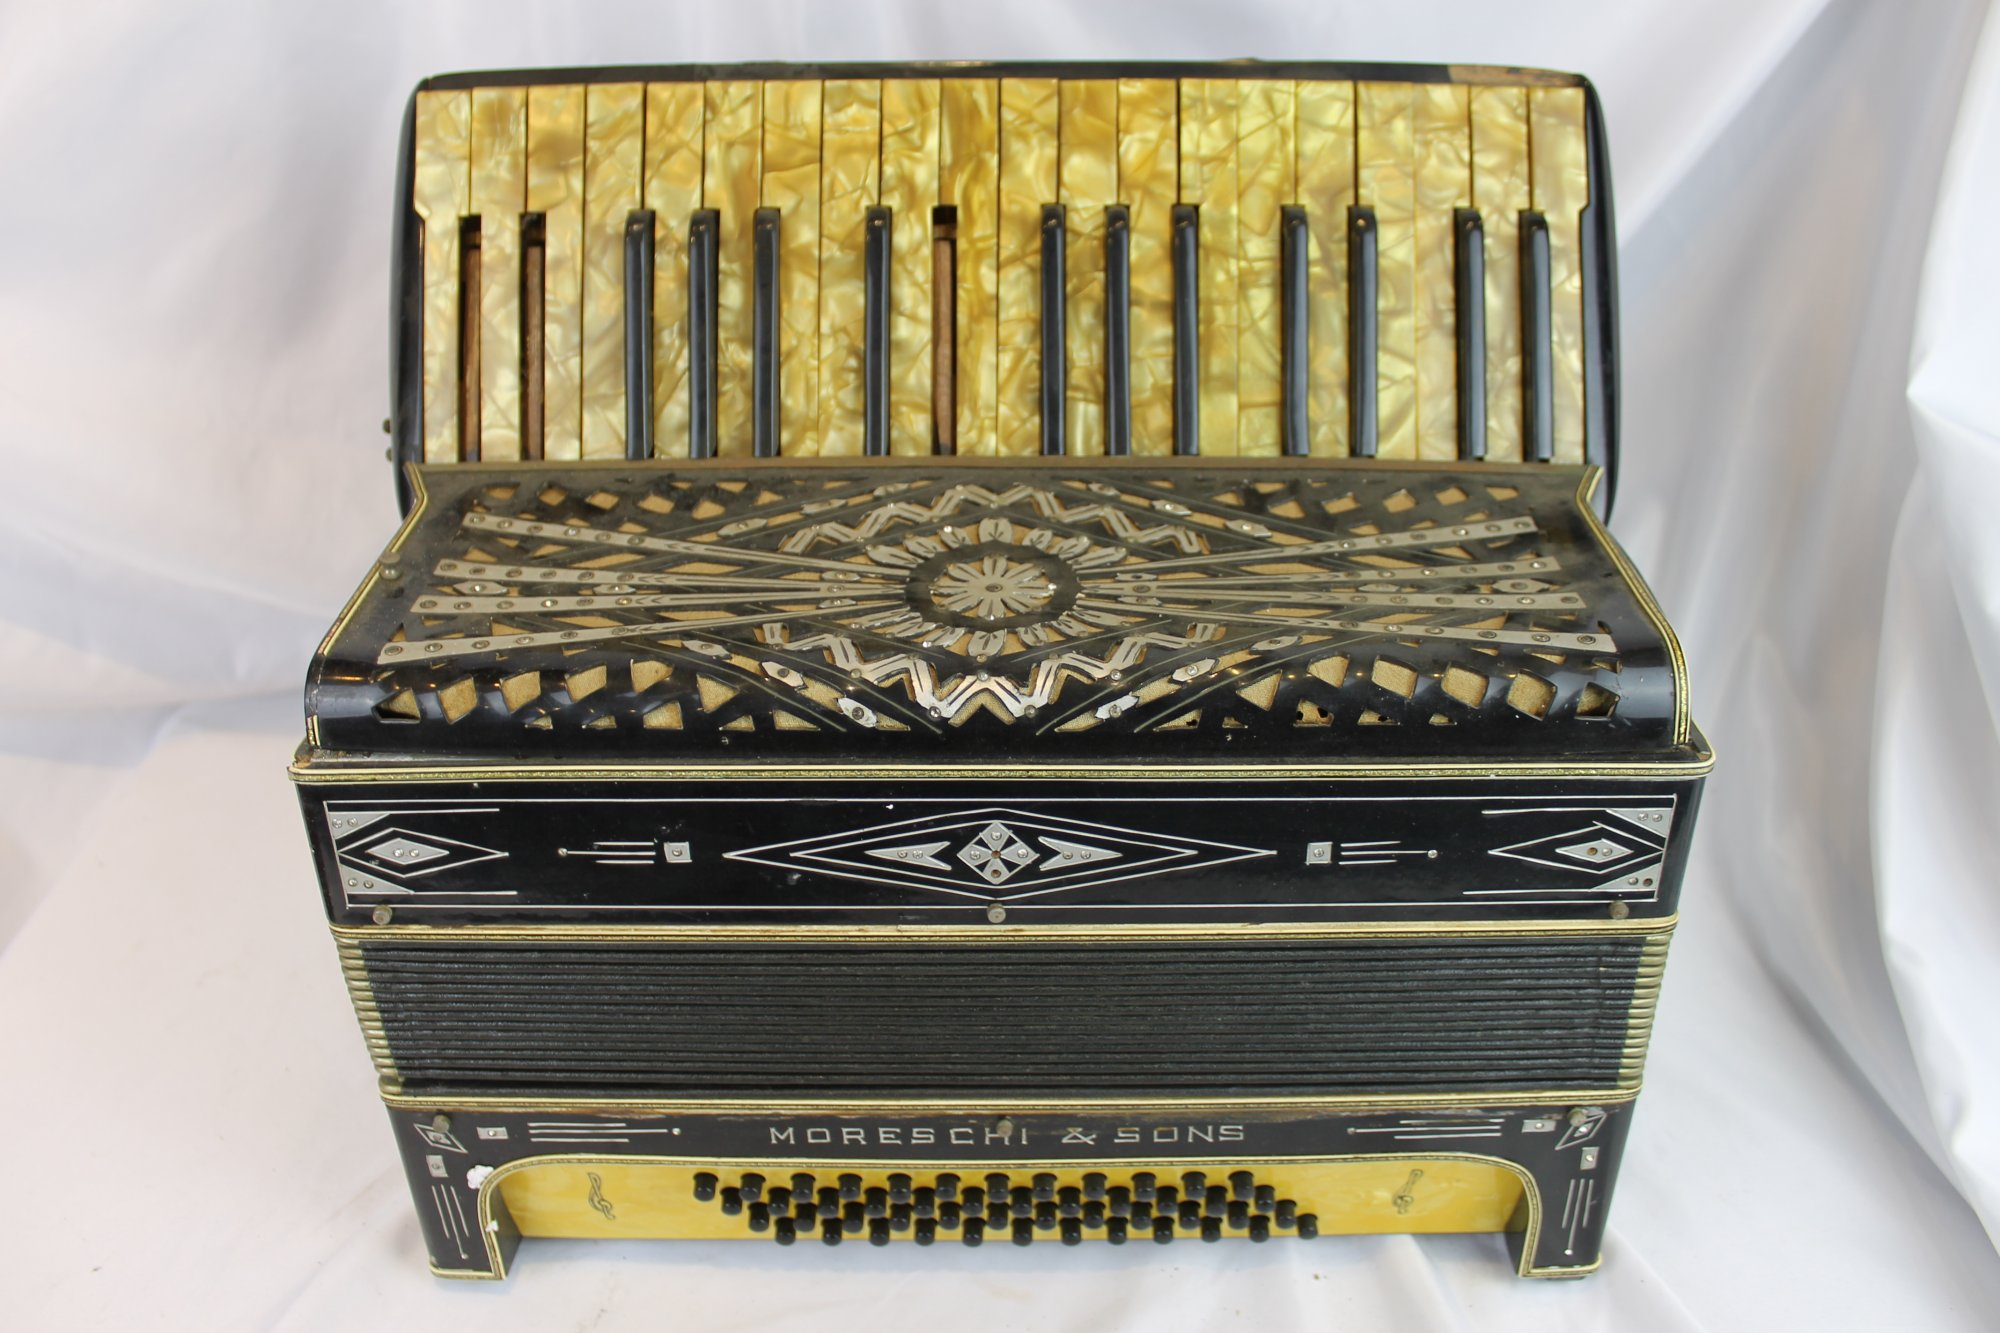 4527 - Black Moreschi & Sons Piano Accordion LMM 34 48 - For Parts or Repair